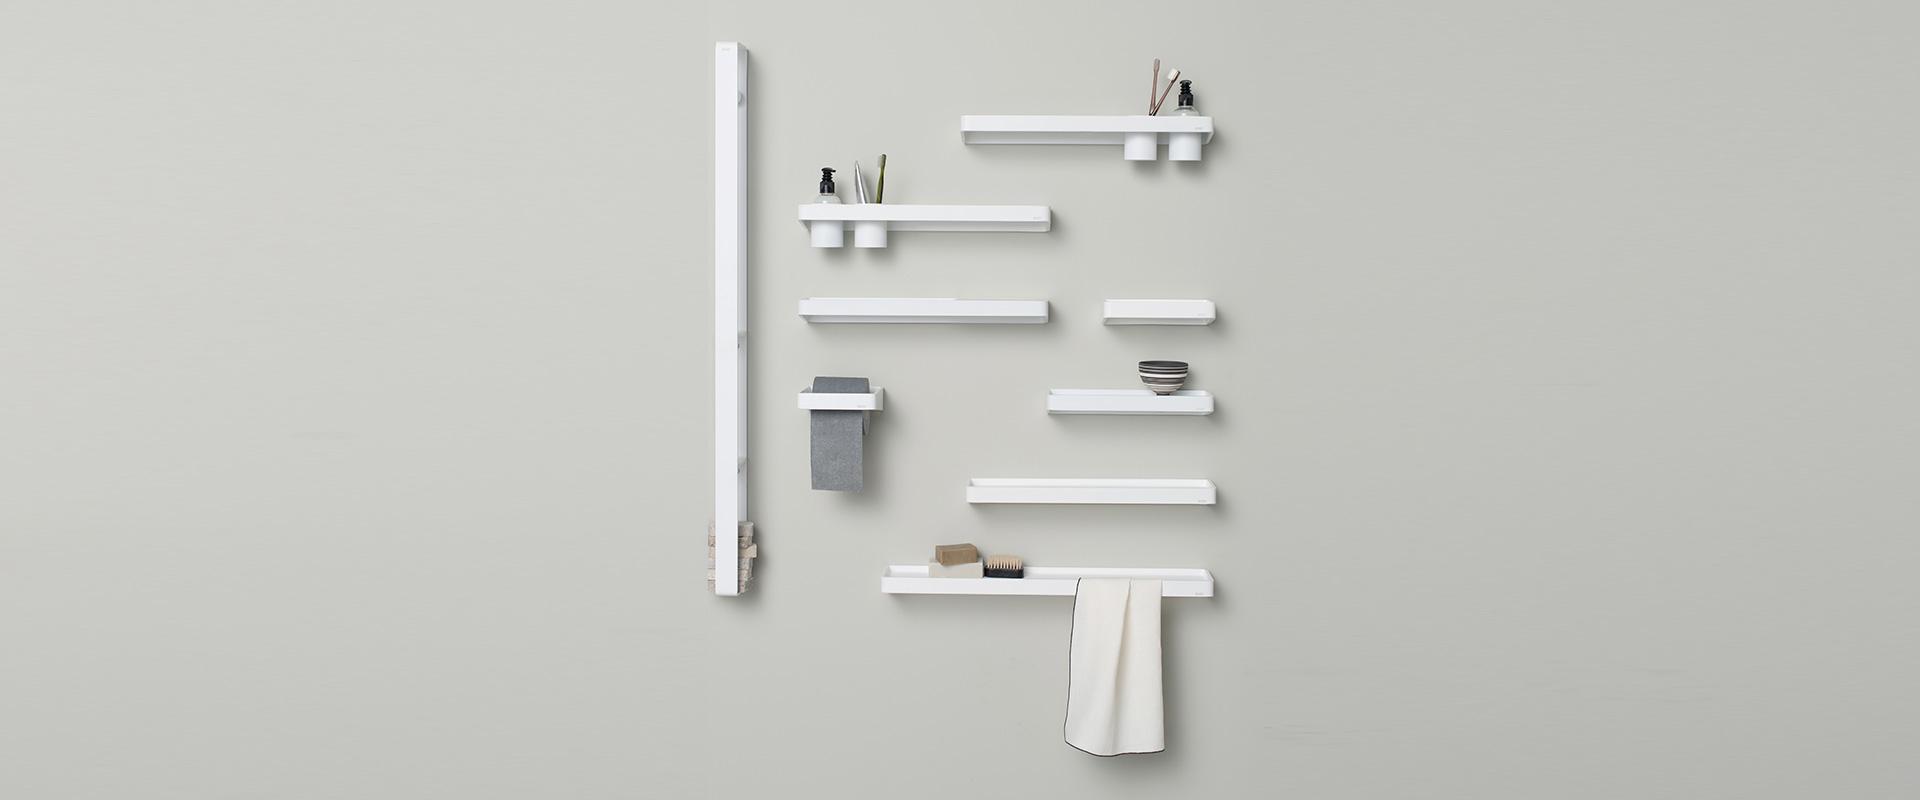 Multifunctional design shelf